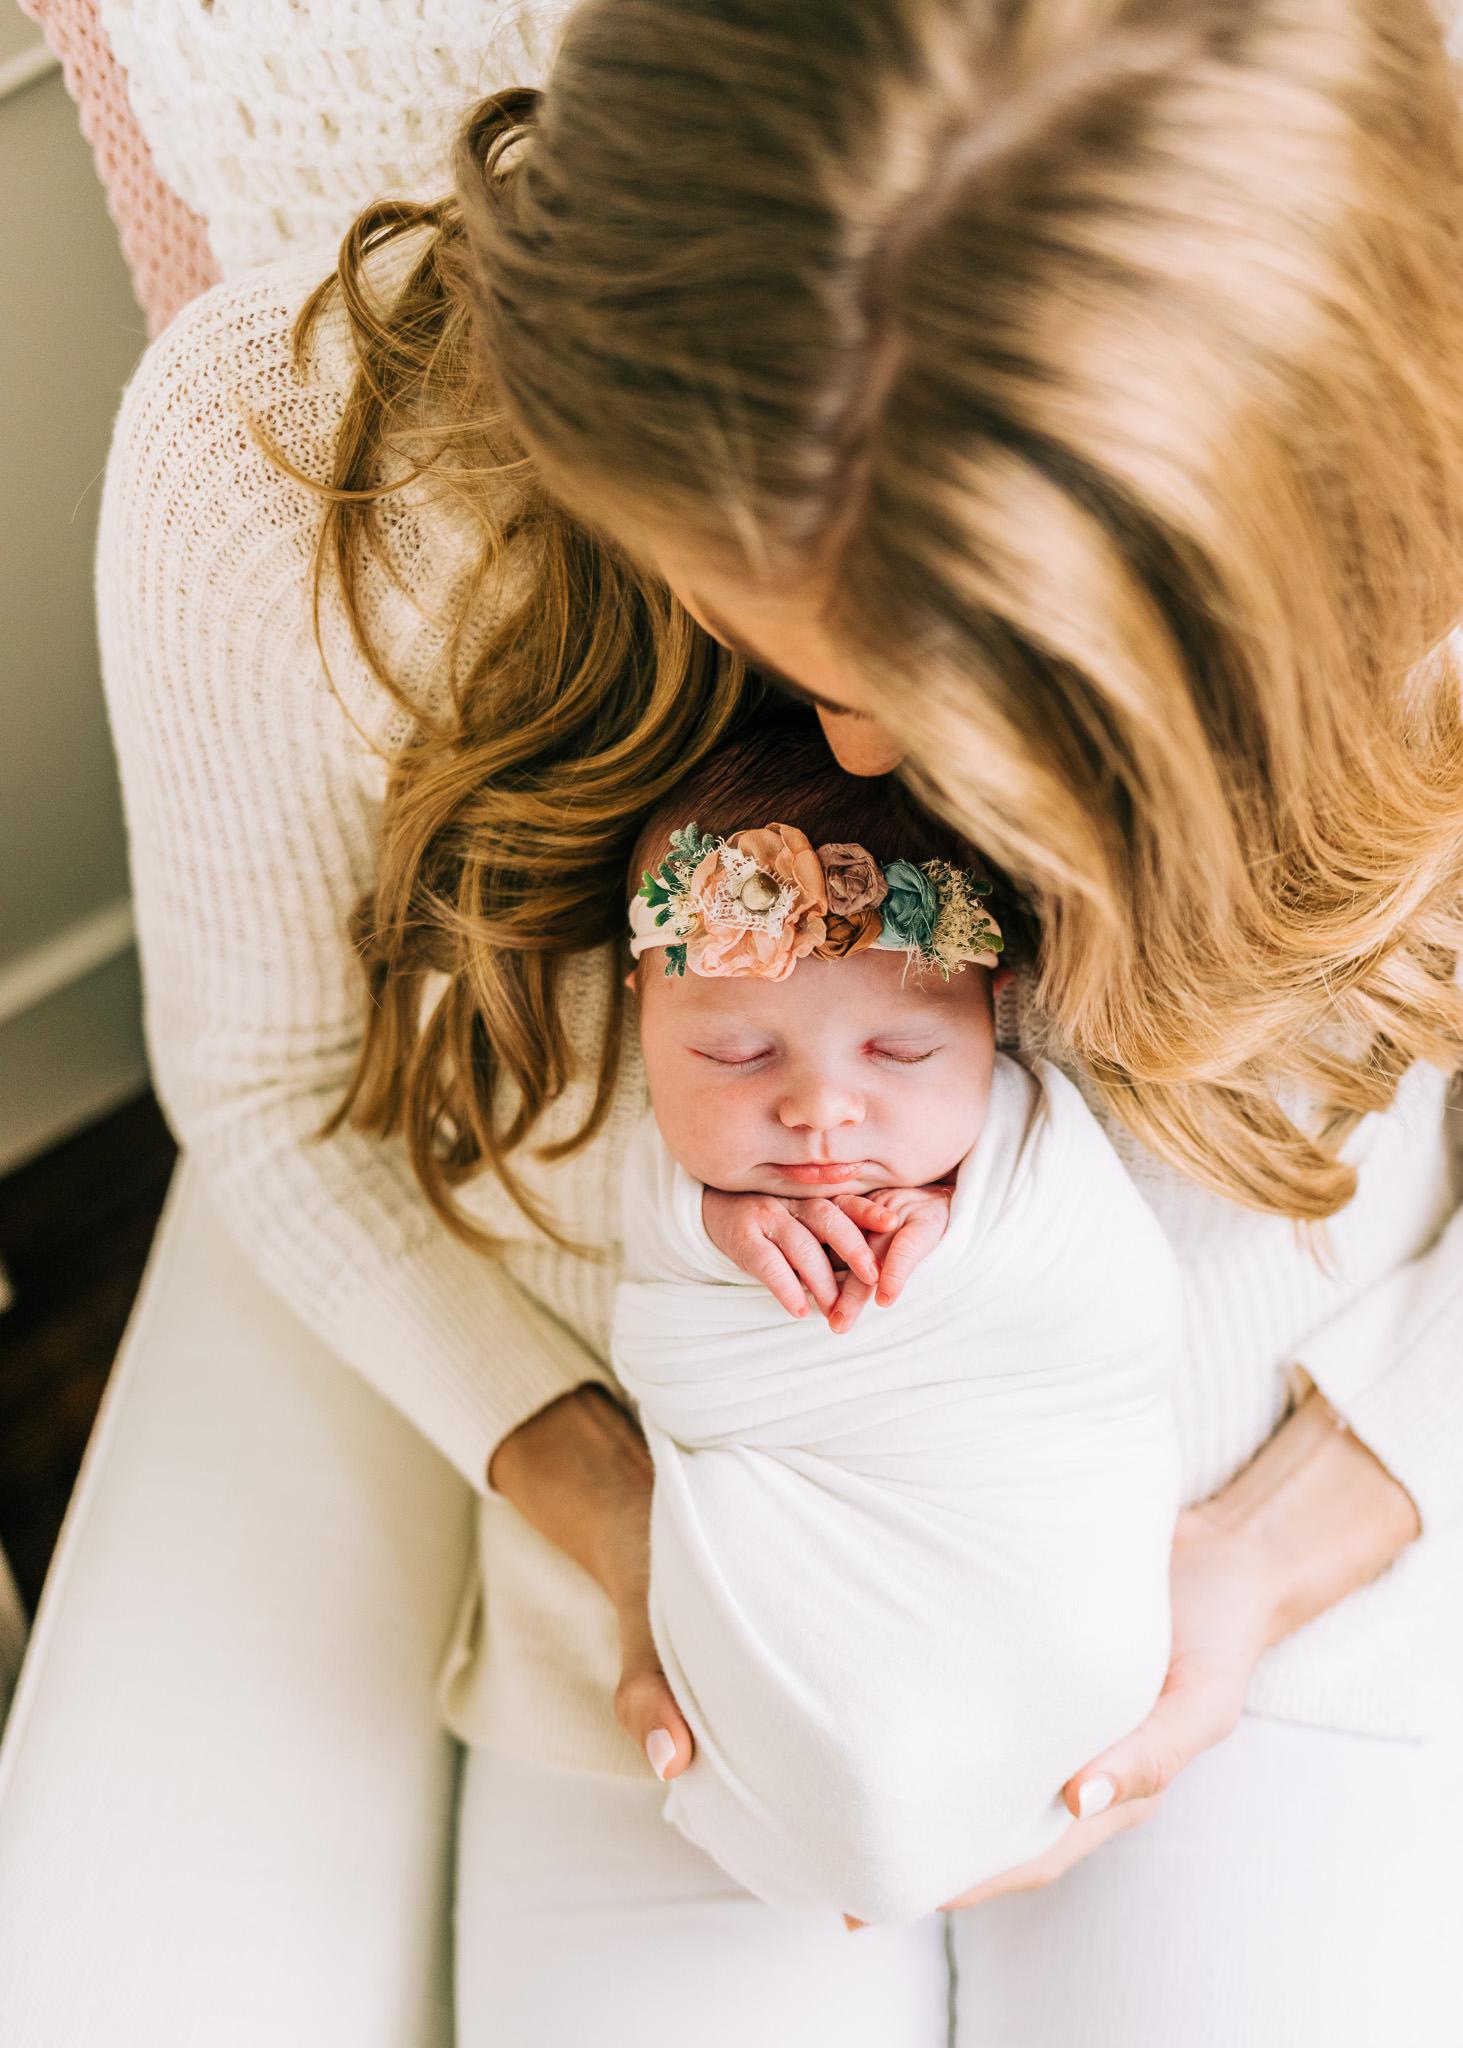 Newborn-Session-Erica-Brooke-Photography